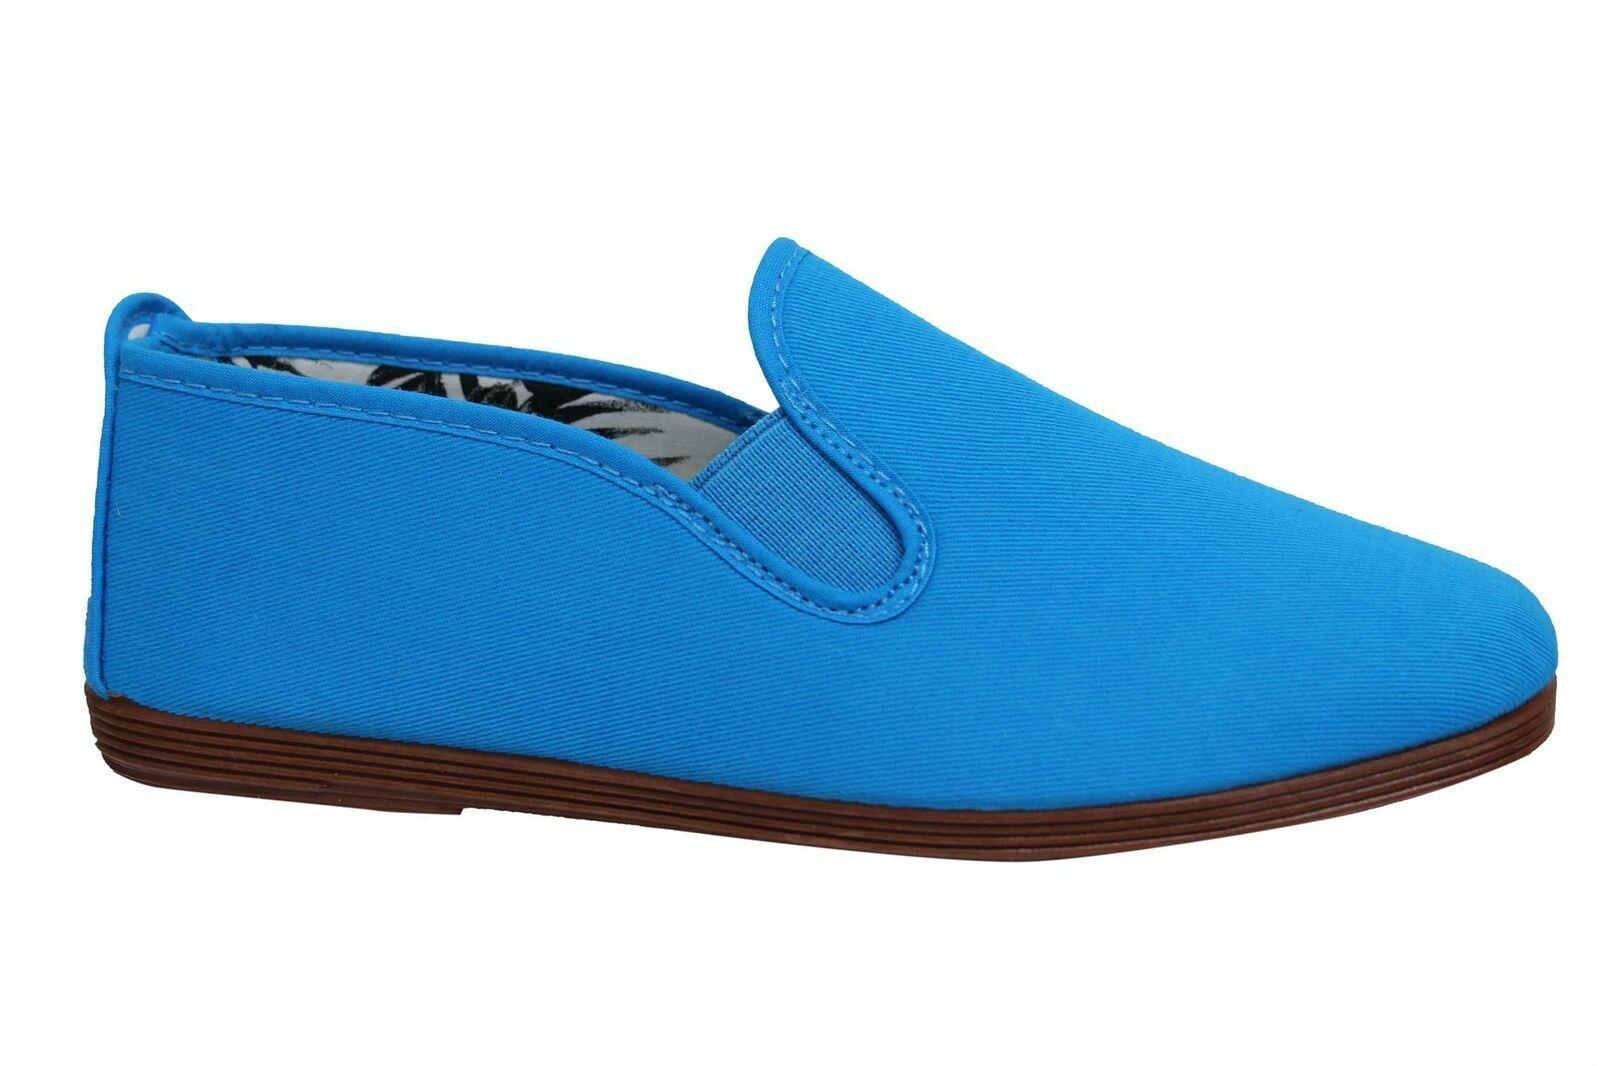 Flossy Style Arnedo Unisex Espadrille Slip On Plimsolls Shoes 55 Blue